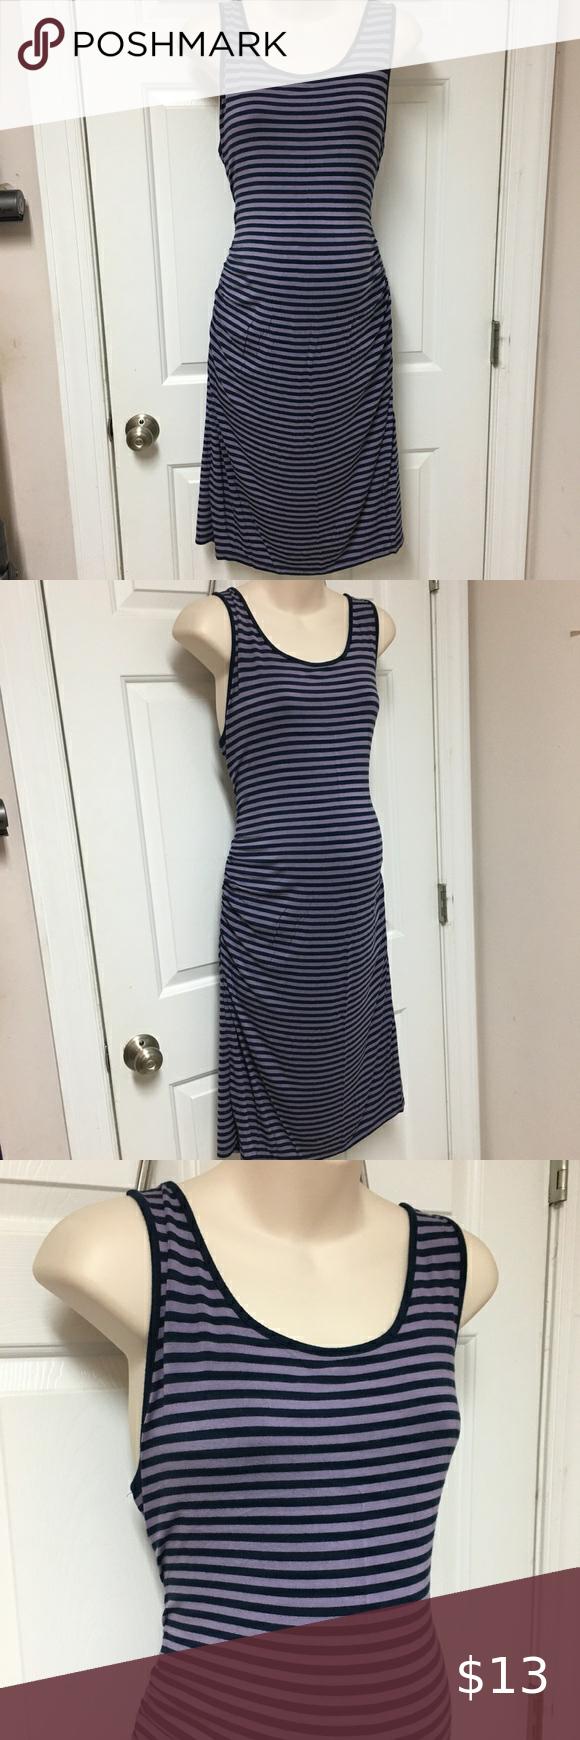 Liz Lange Maternity Purple Blue Striped Bodycon L Cute Body Con Dress Size Large Knee Length Liz Lange For Target Dress Liz Lange Blue And Purple Blue Stripes [ 1740 x 580 Pixel ]